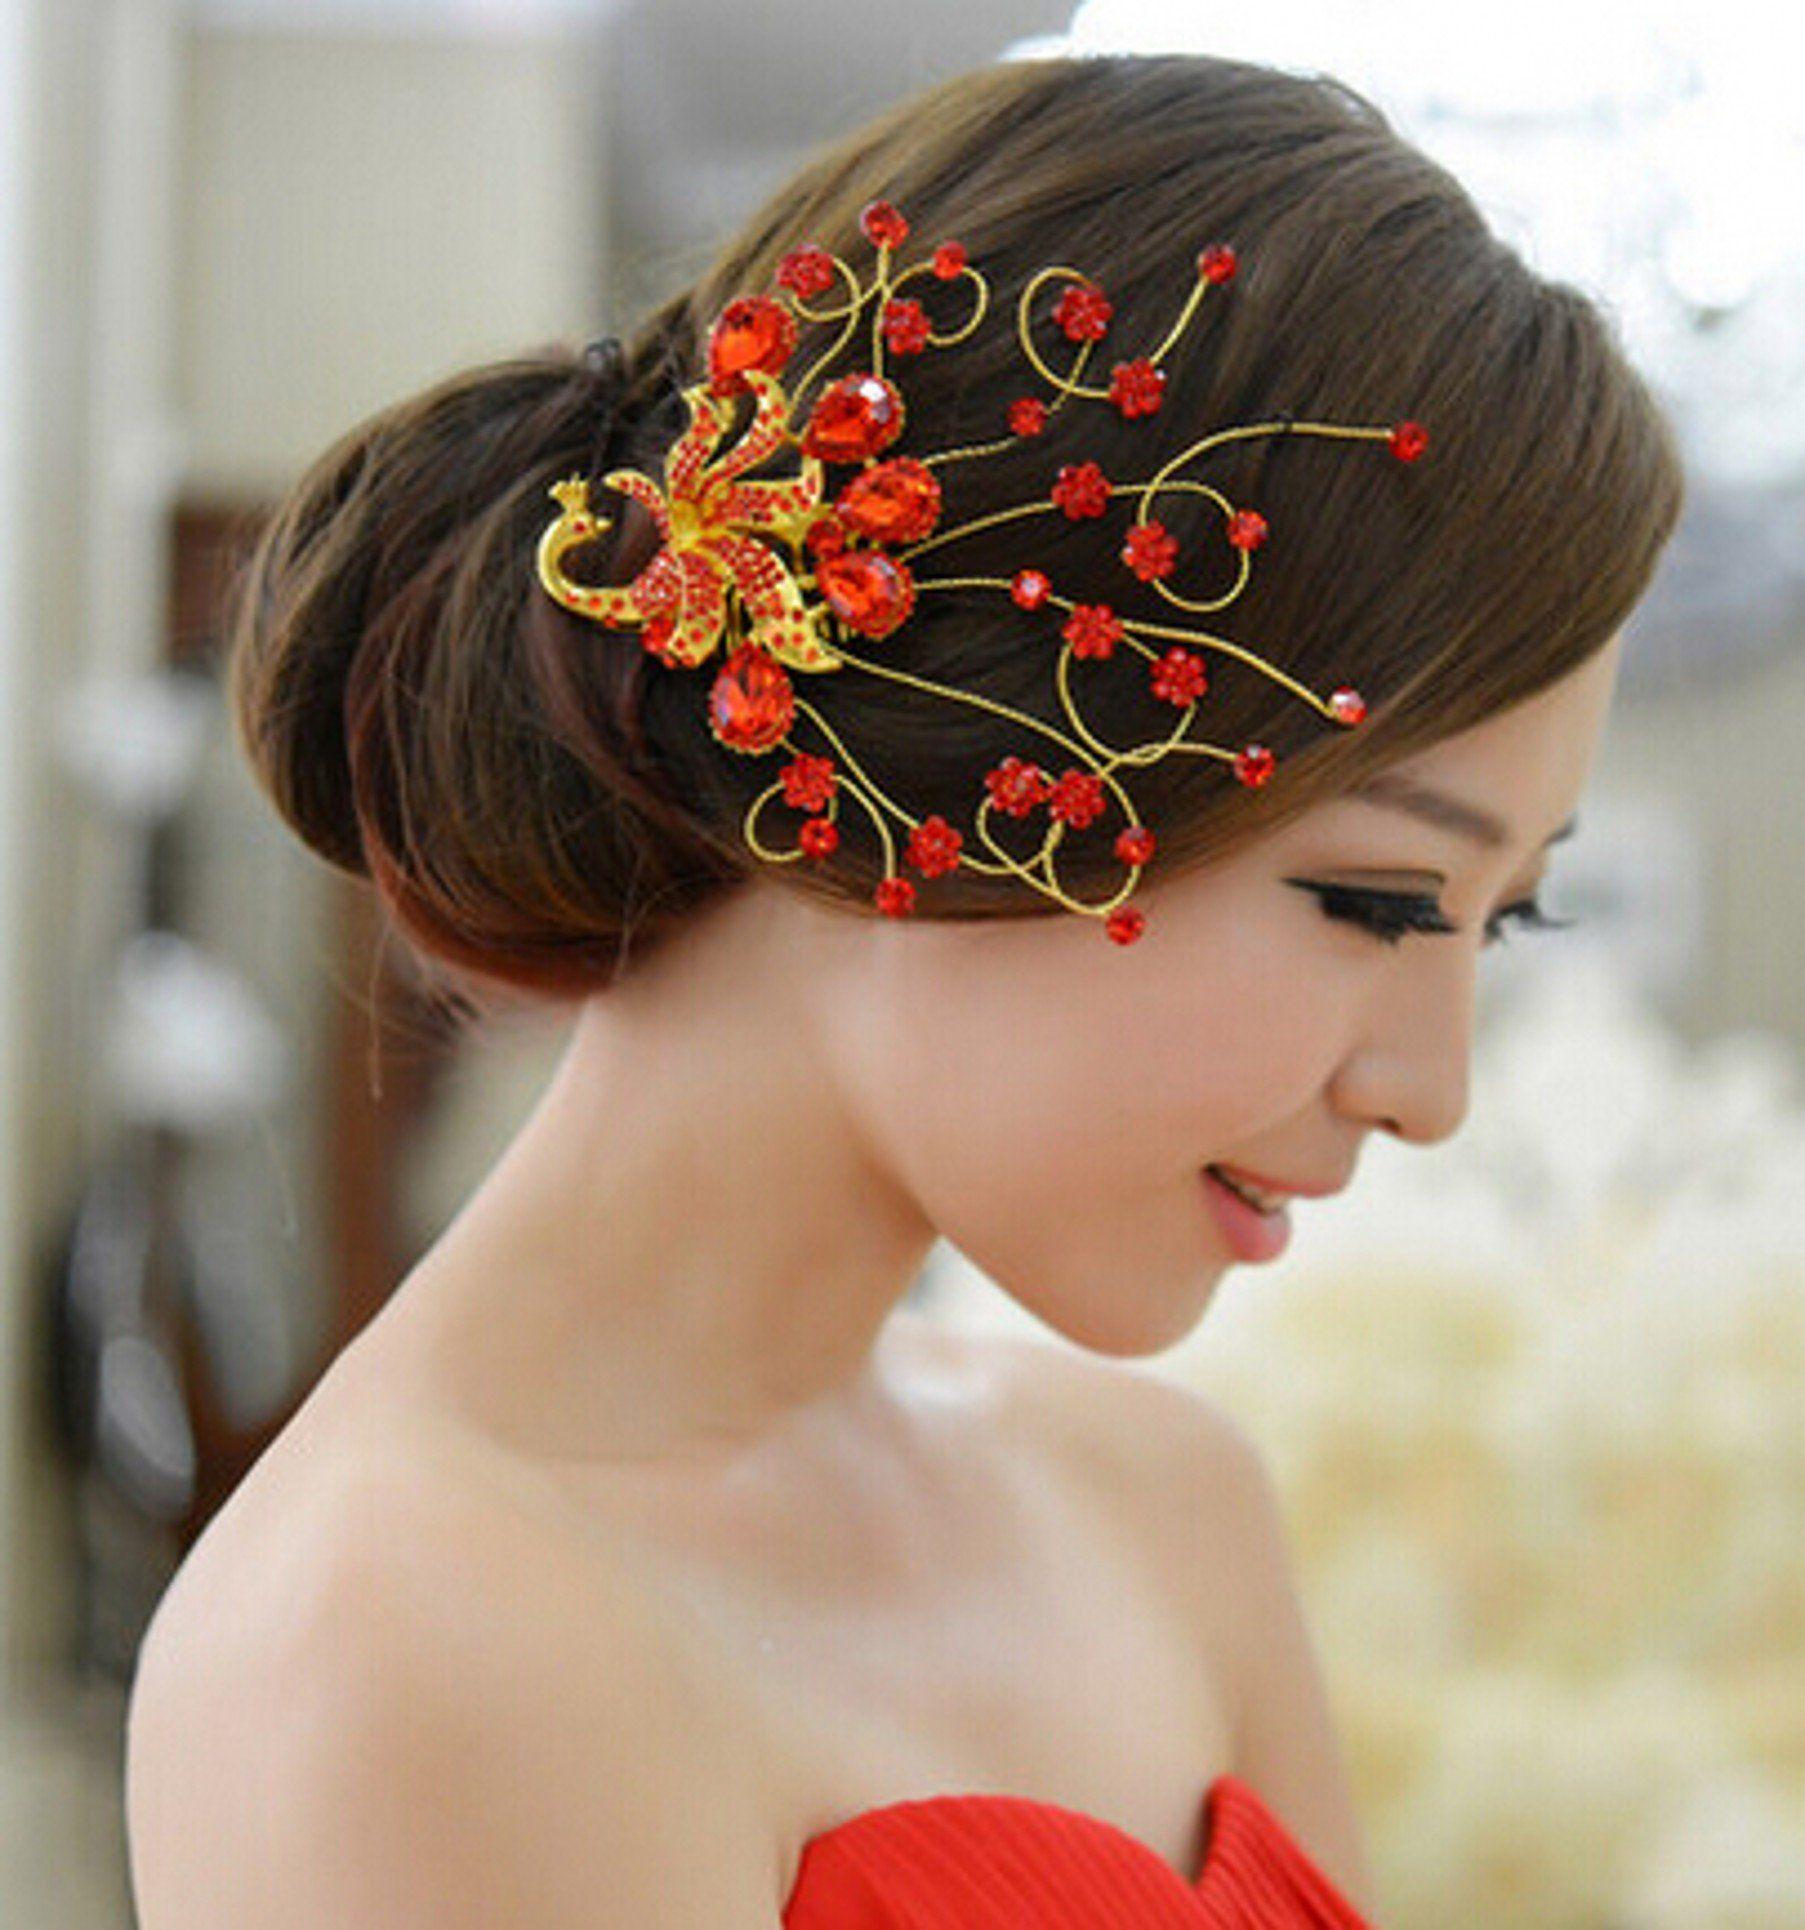 anita women's fascinators wedding phoenix coronet forehead